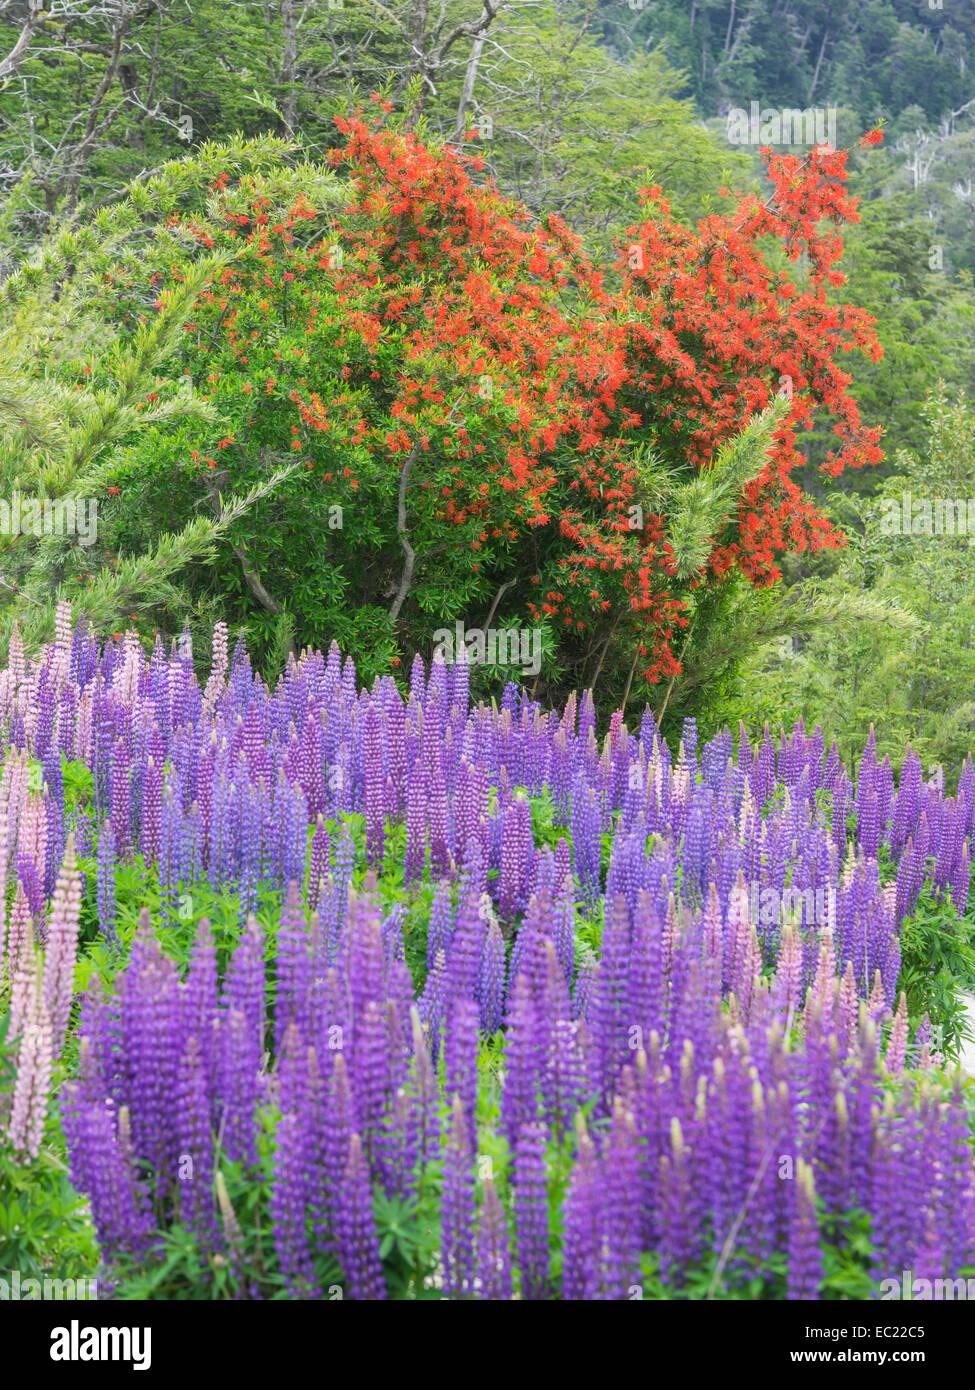 Lupines (Lupinus sp.) and Chilean firebush (Embothrium coccineum), Neuquén Province, Argentina - Stock Image